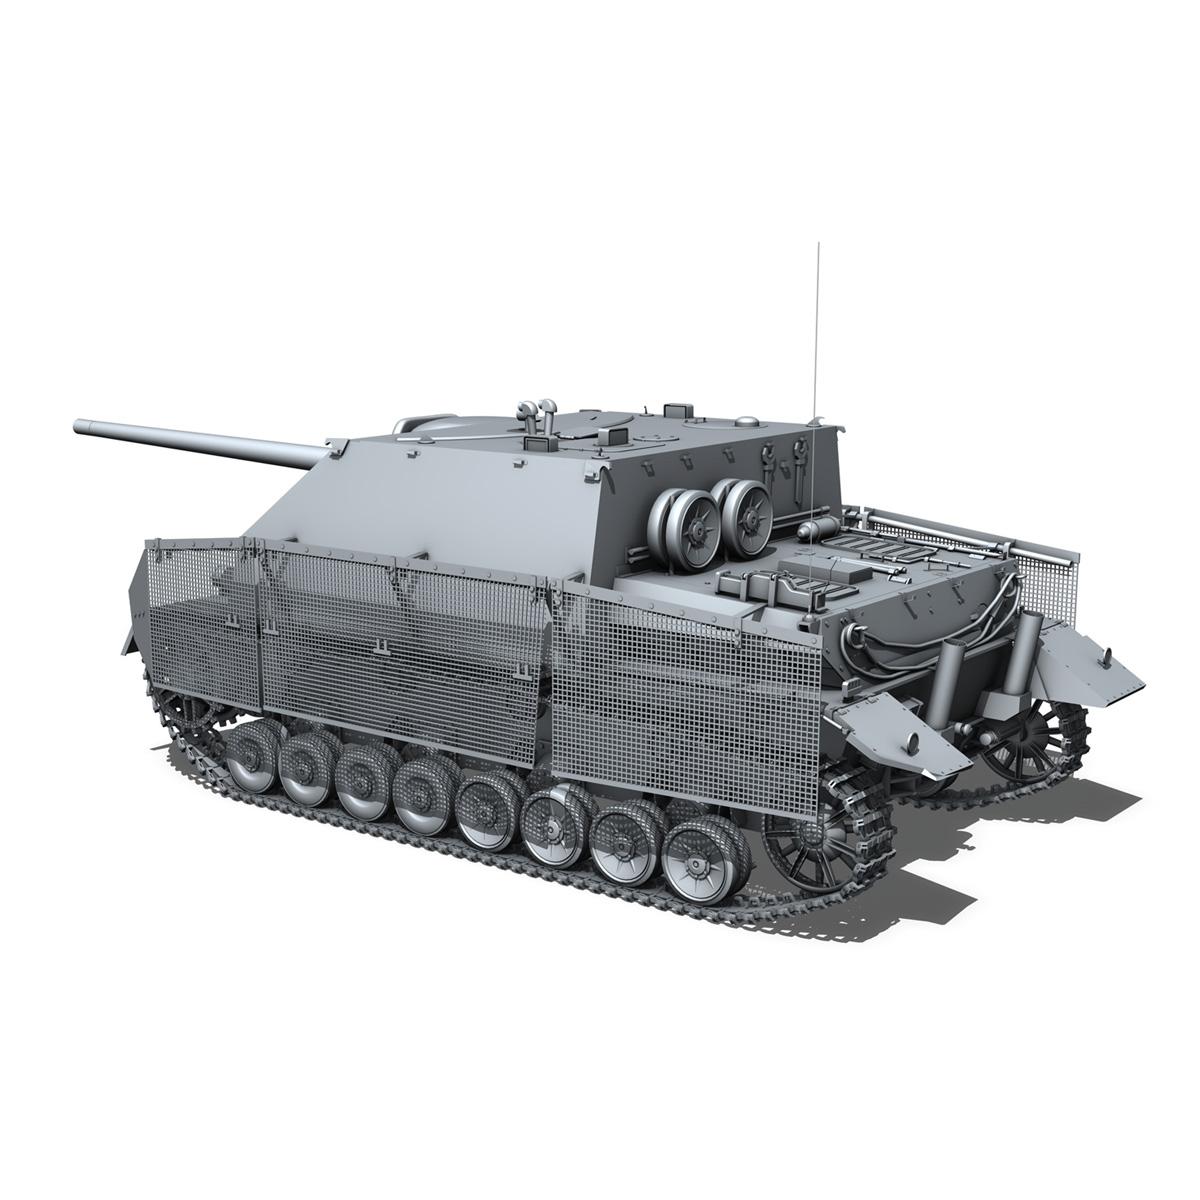 jagdpanzer iv l/70 (a) – sd.kfz 162/1 3d model 3ds fbx c4d lwo obj 202010